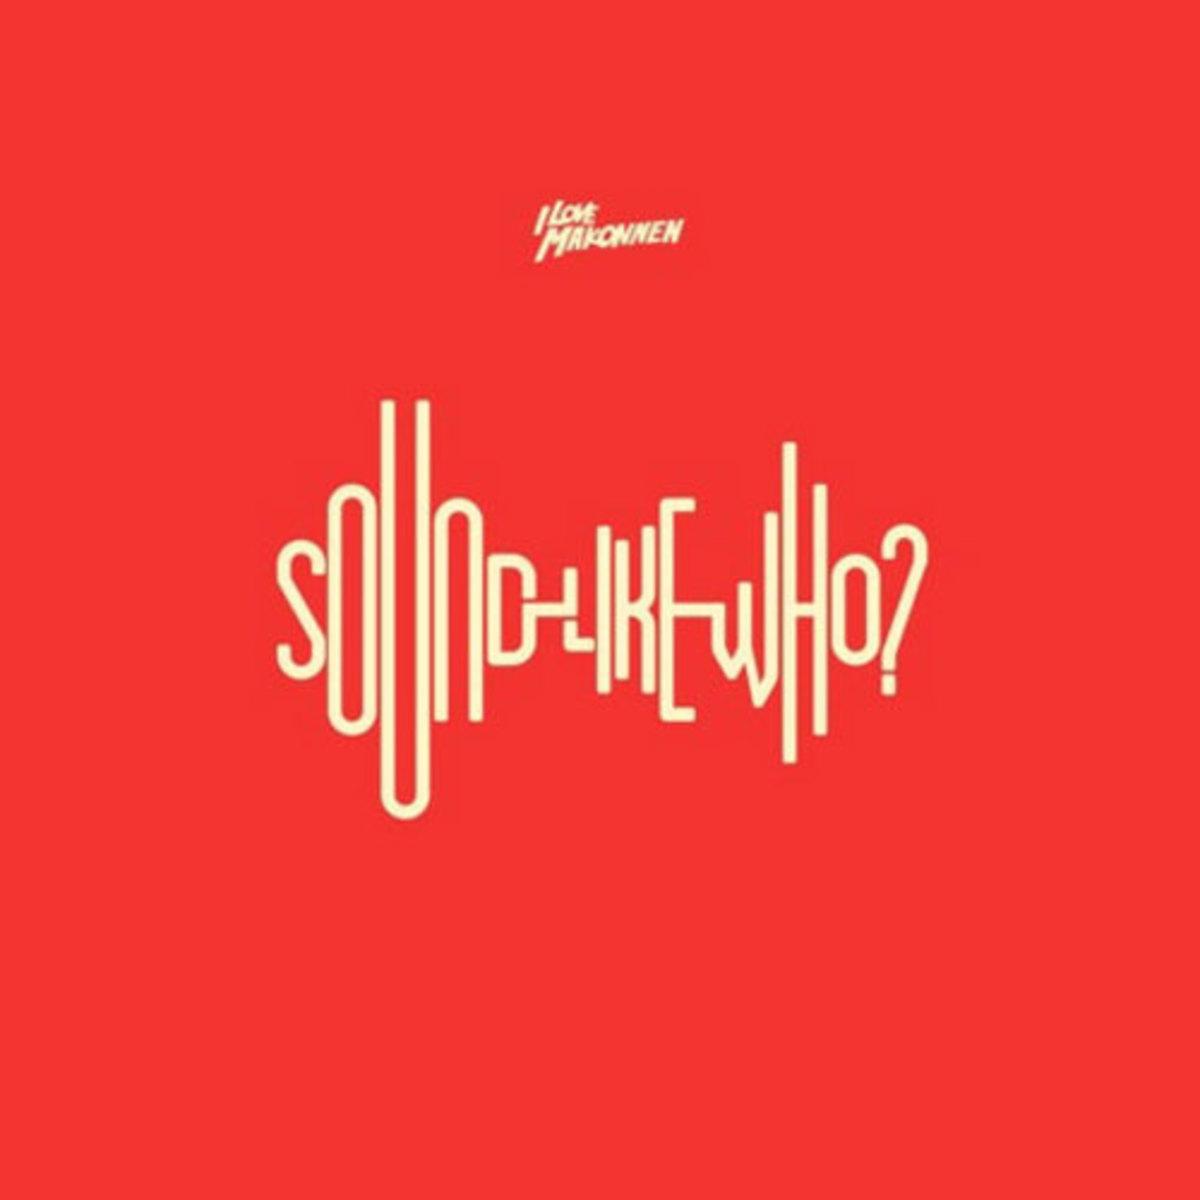 makonnen-sound-like-who.jpg